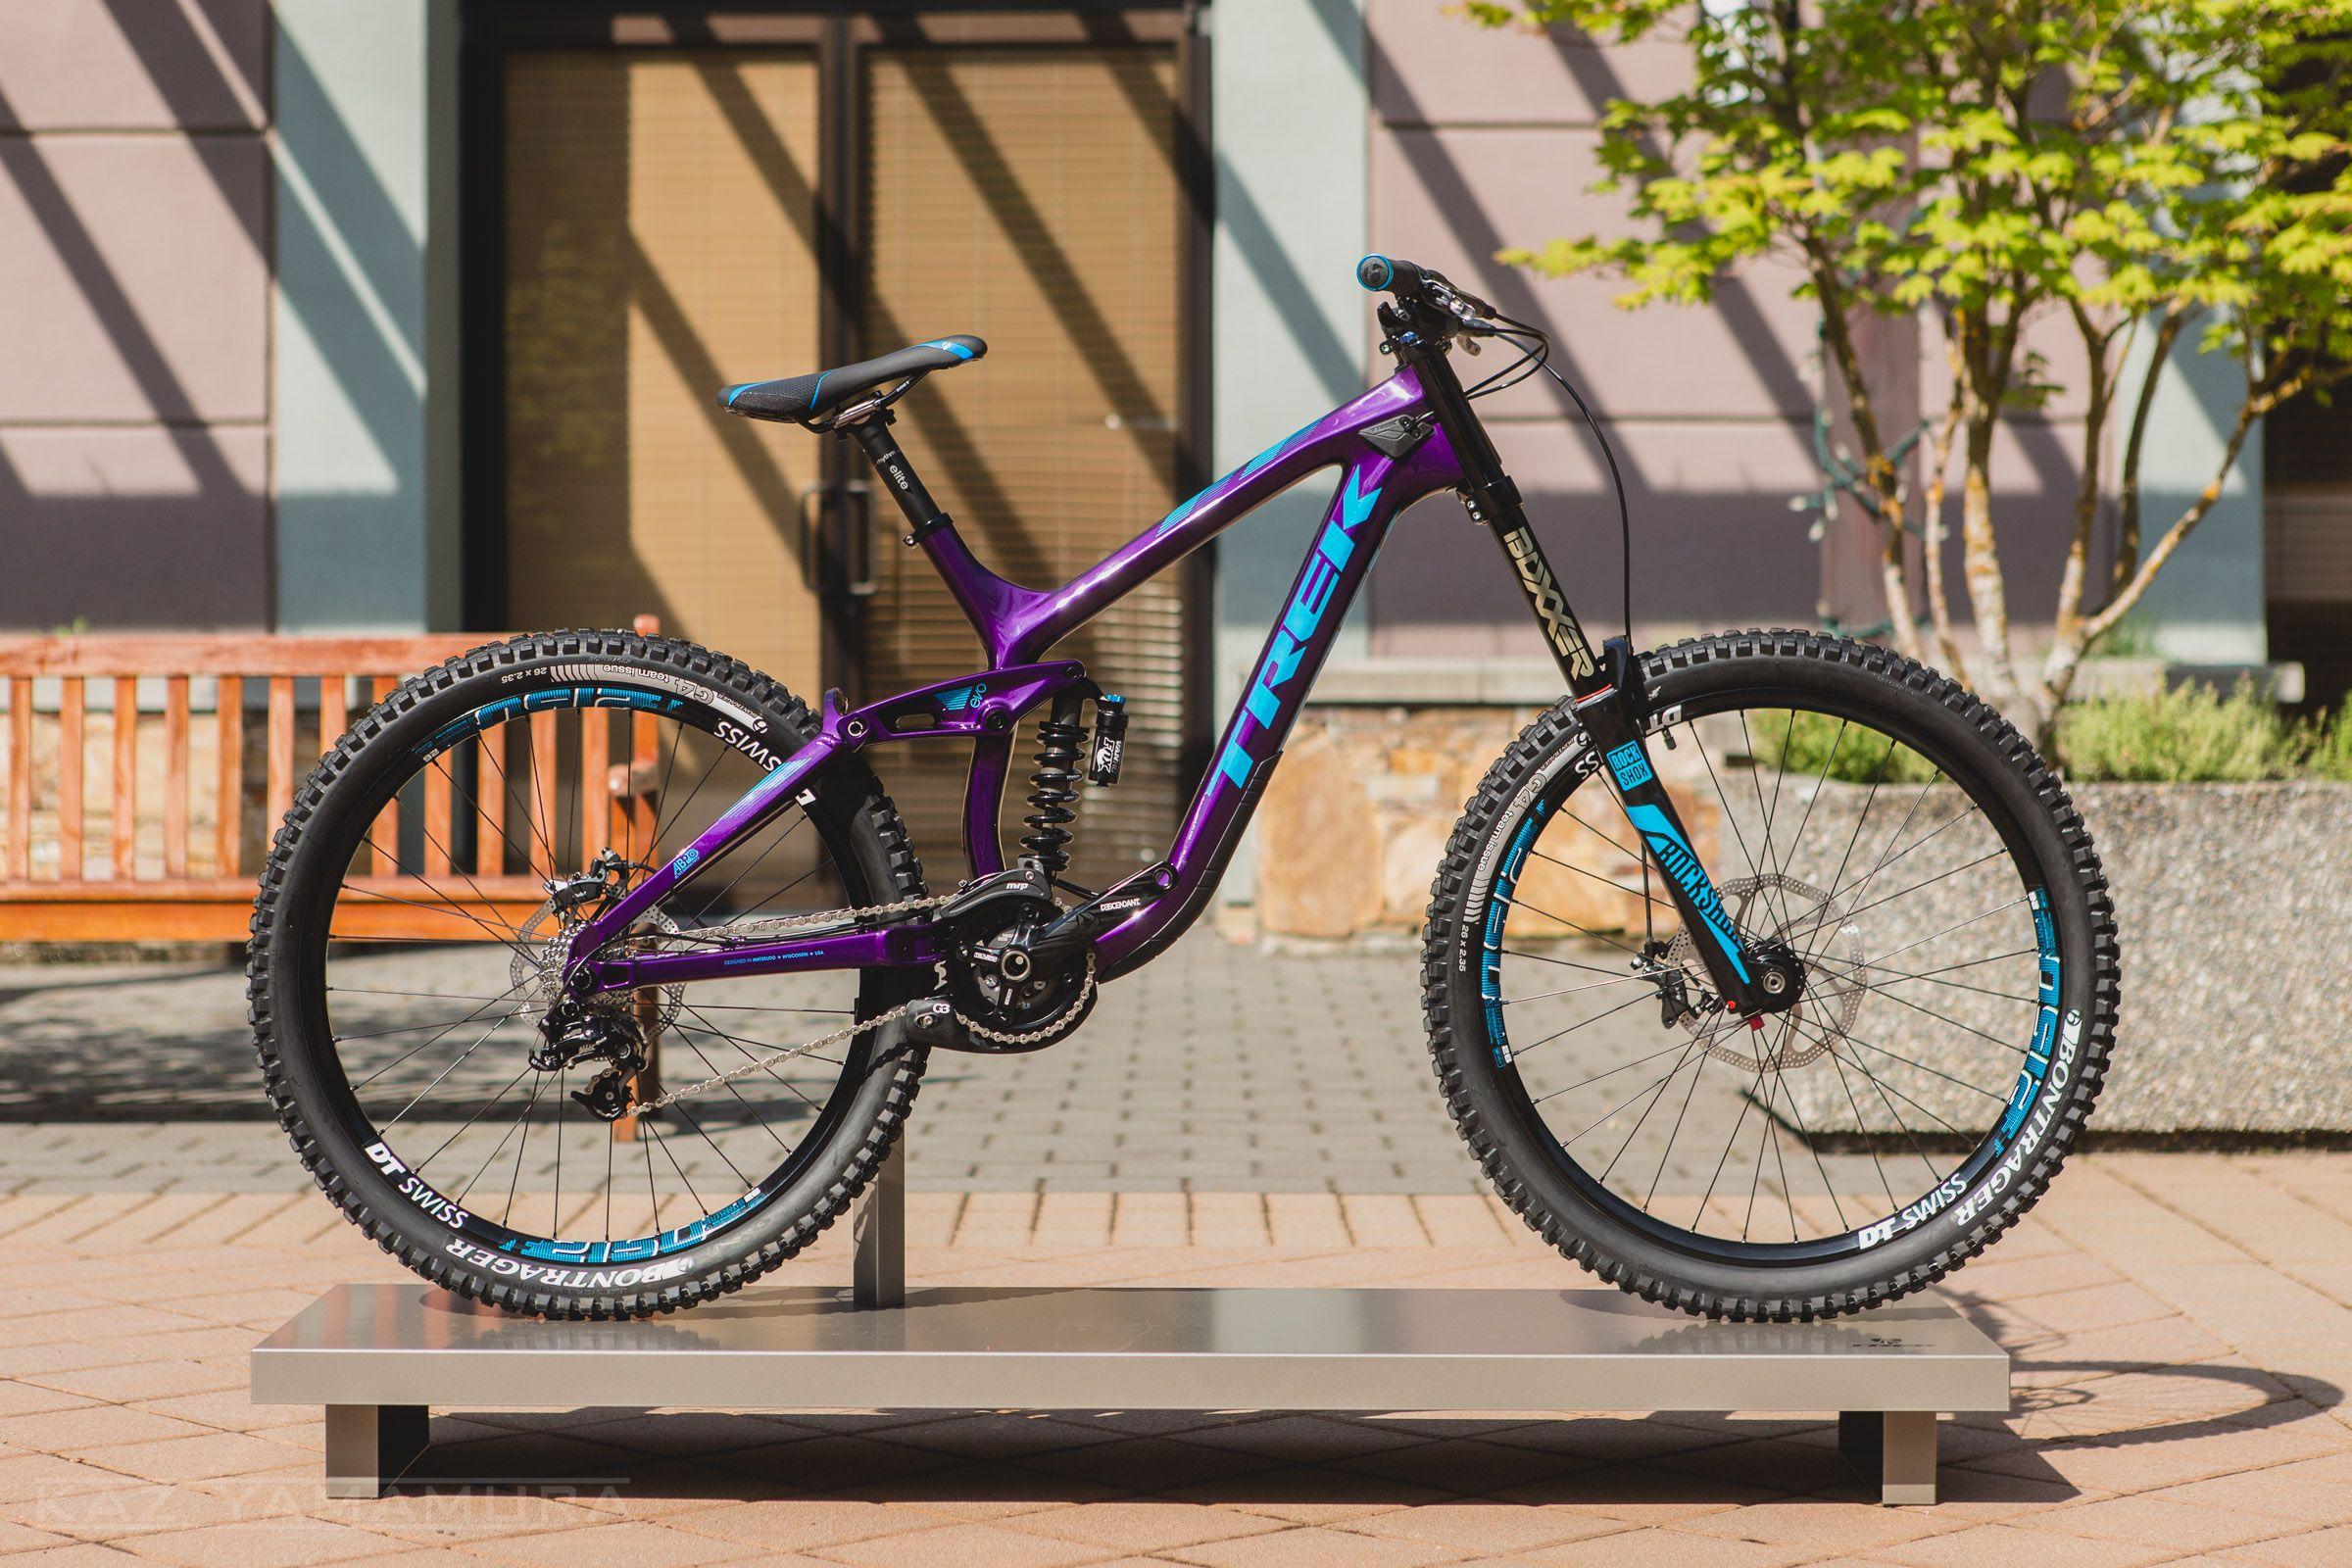 2015 Trek Session Park Stunt Bike Trek Bikes Bike Rider